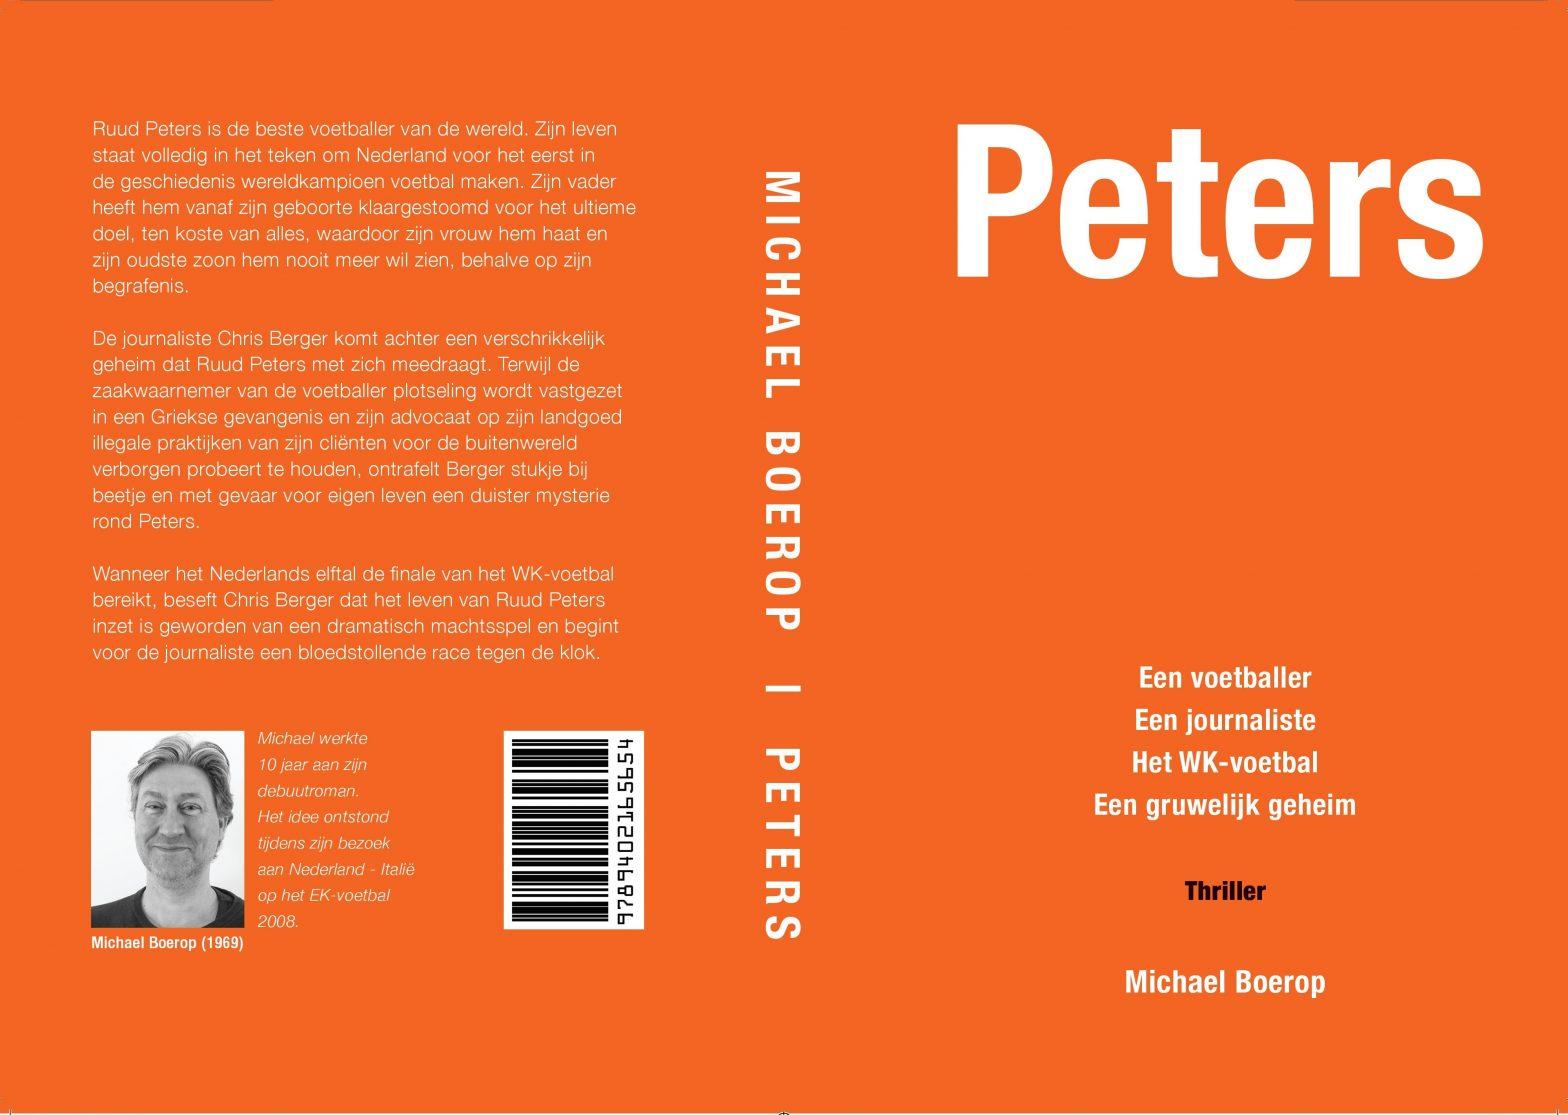 Voetbalthriller Peters Michael Boerop